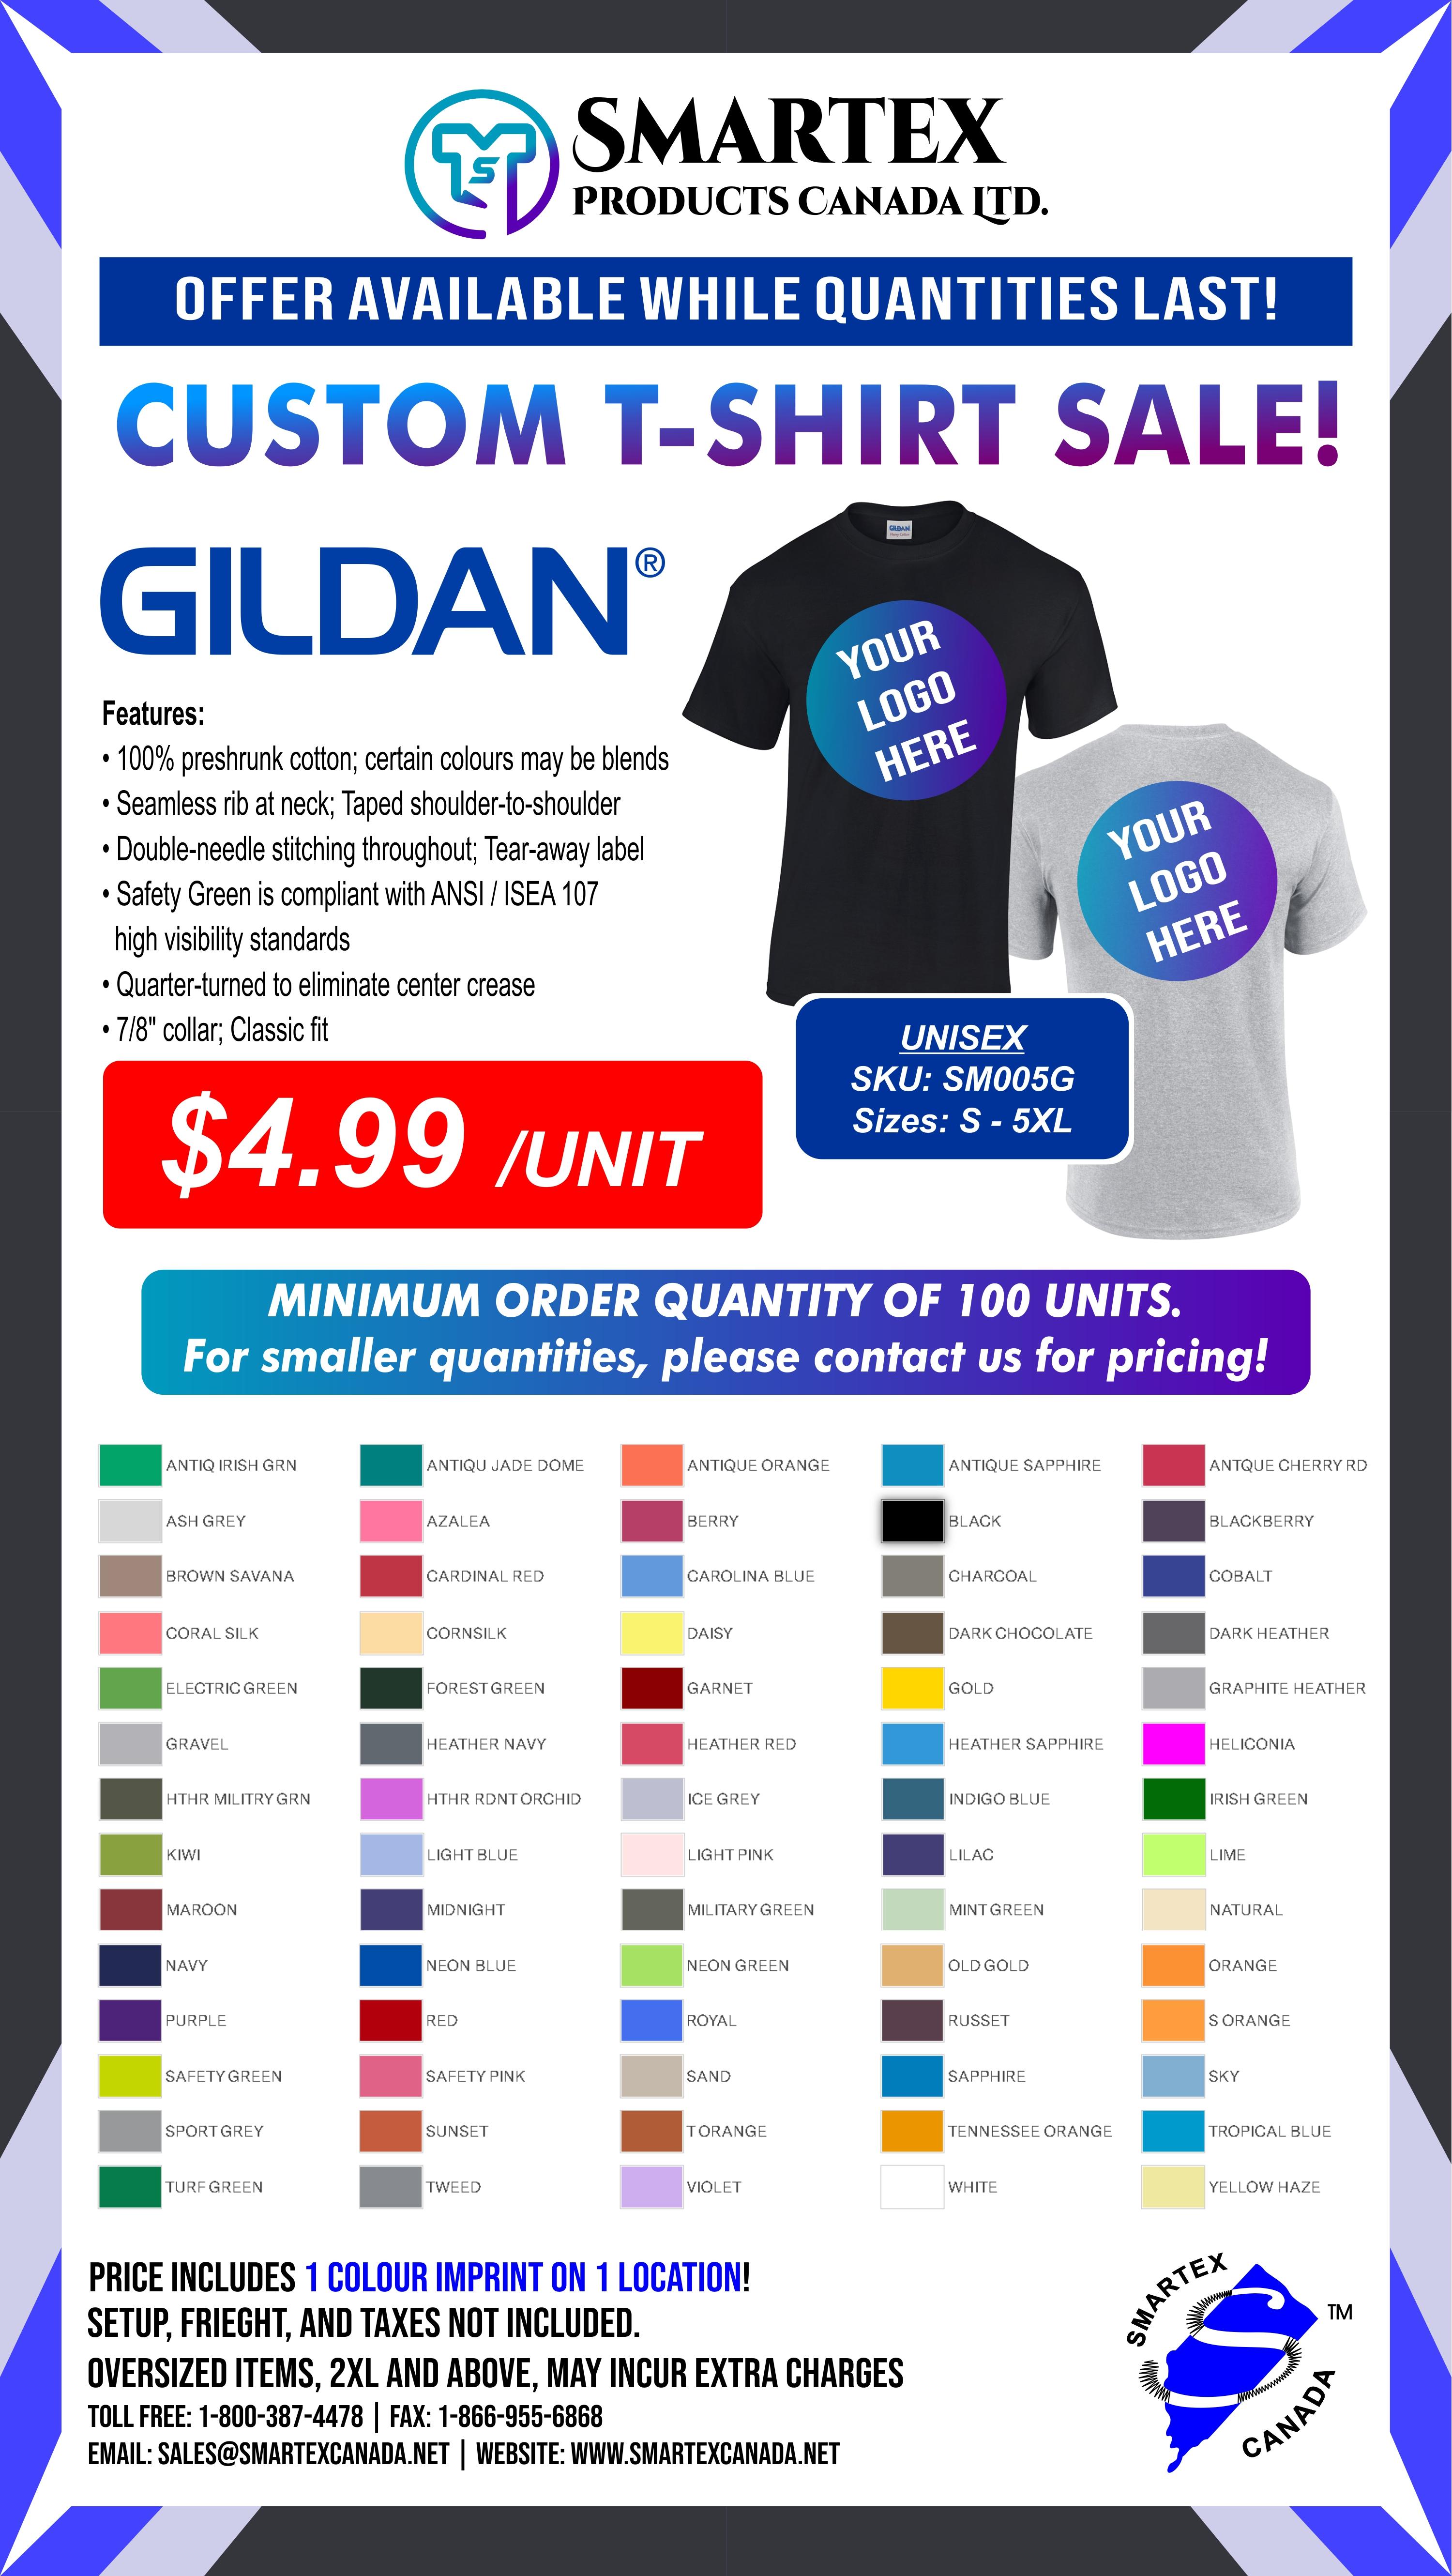 Gildan Custom T-Shirt SALE